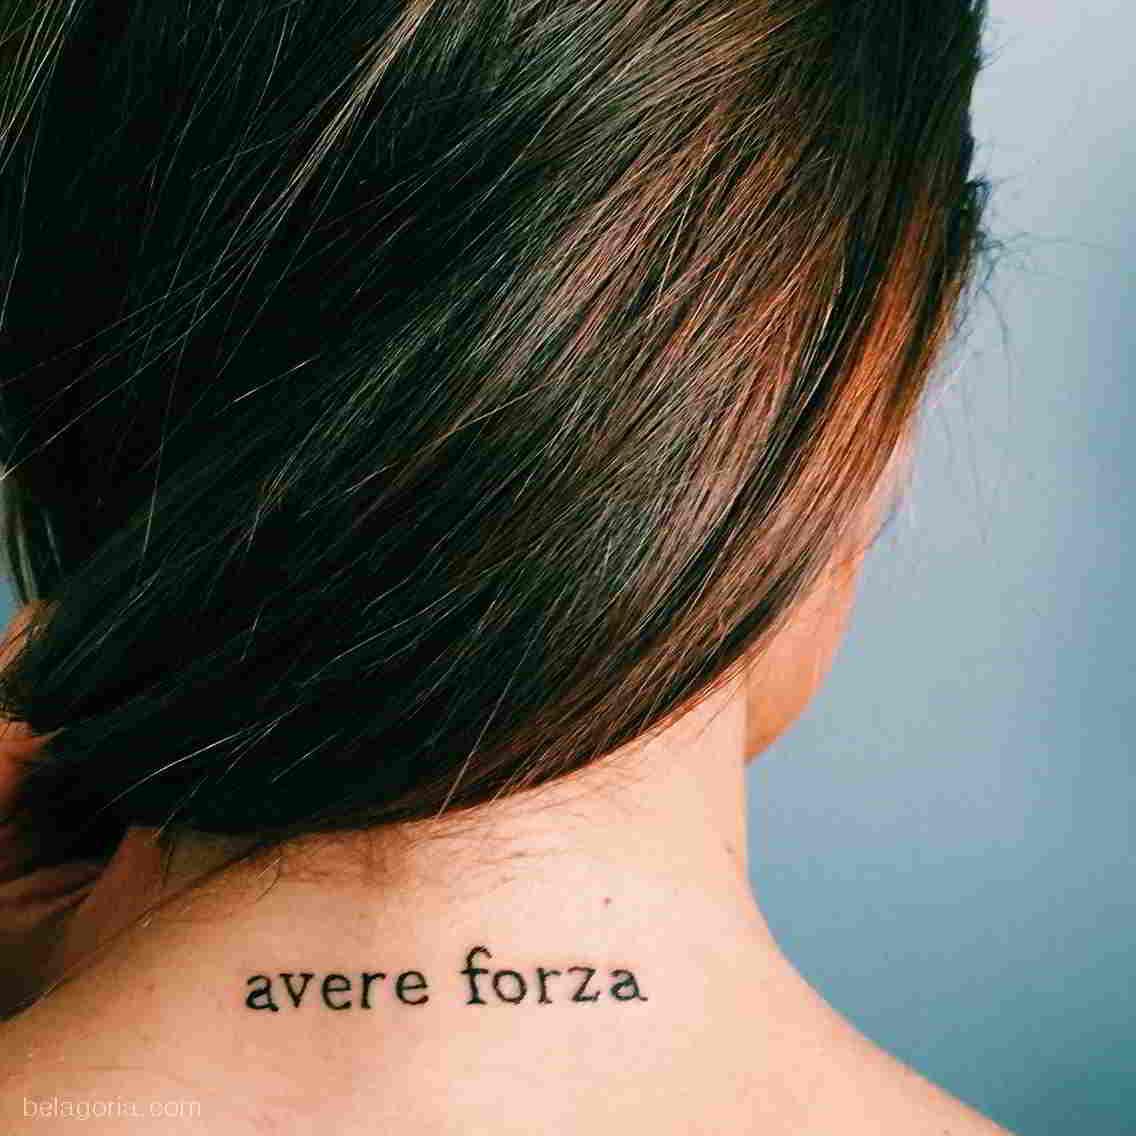 40 Tatuajes De Frases En Latín Para Mujeres Belagoria La Web De